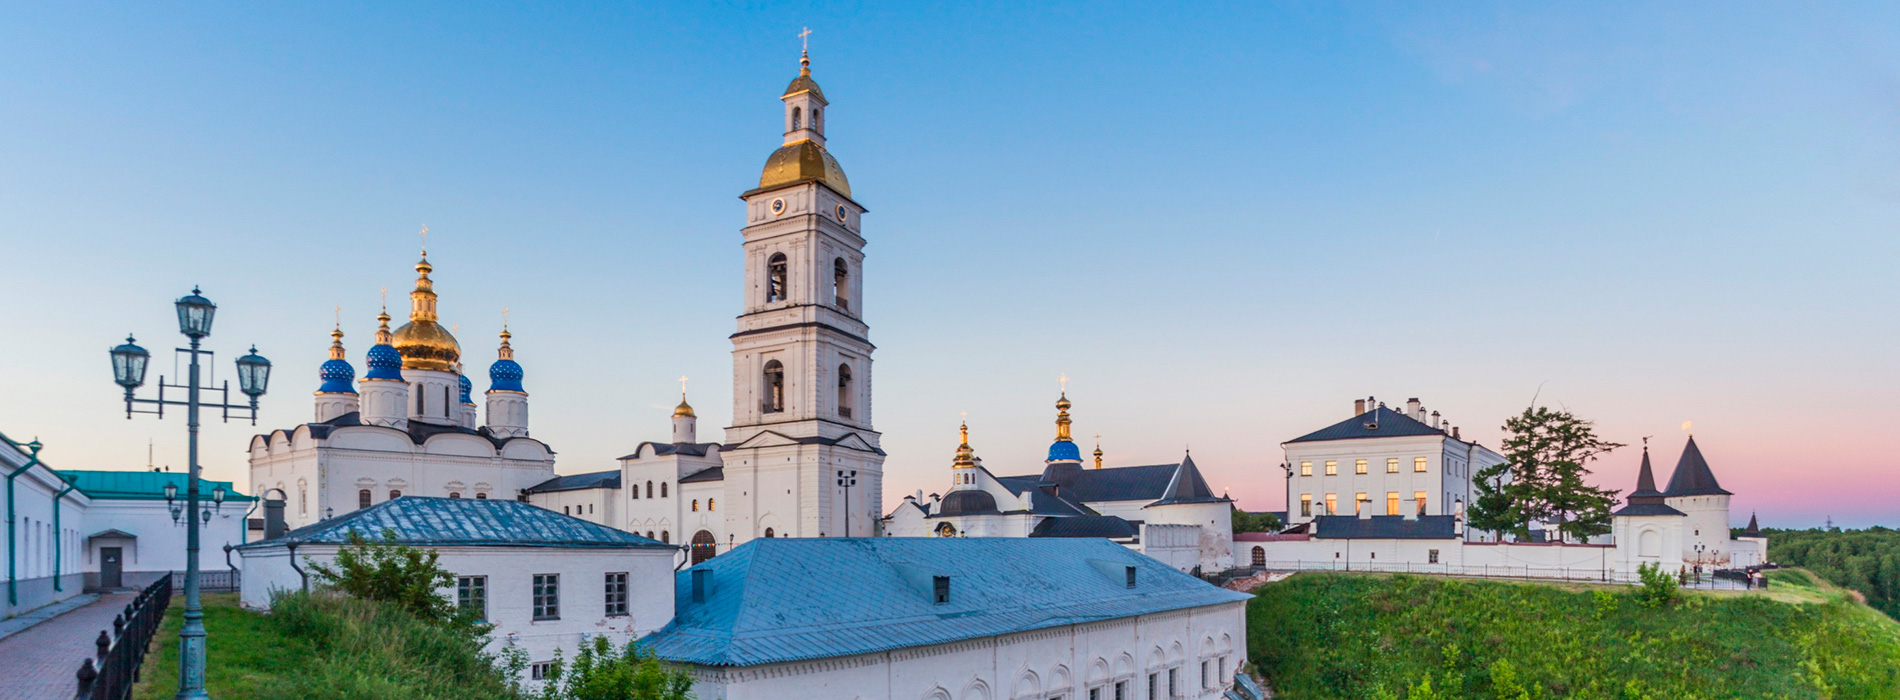 Знакомство с самым старым сибирским городом